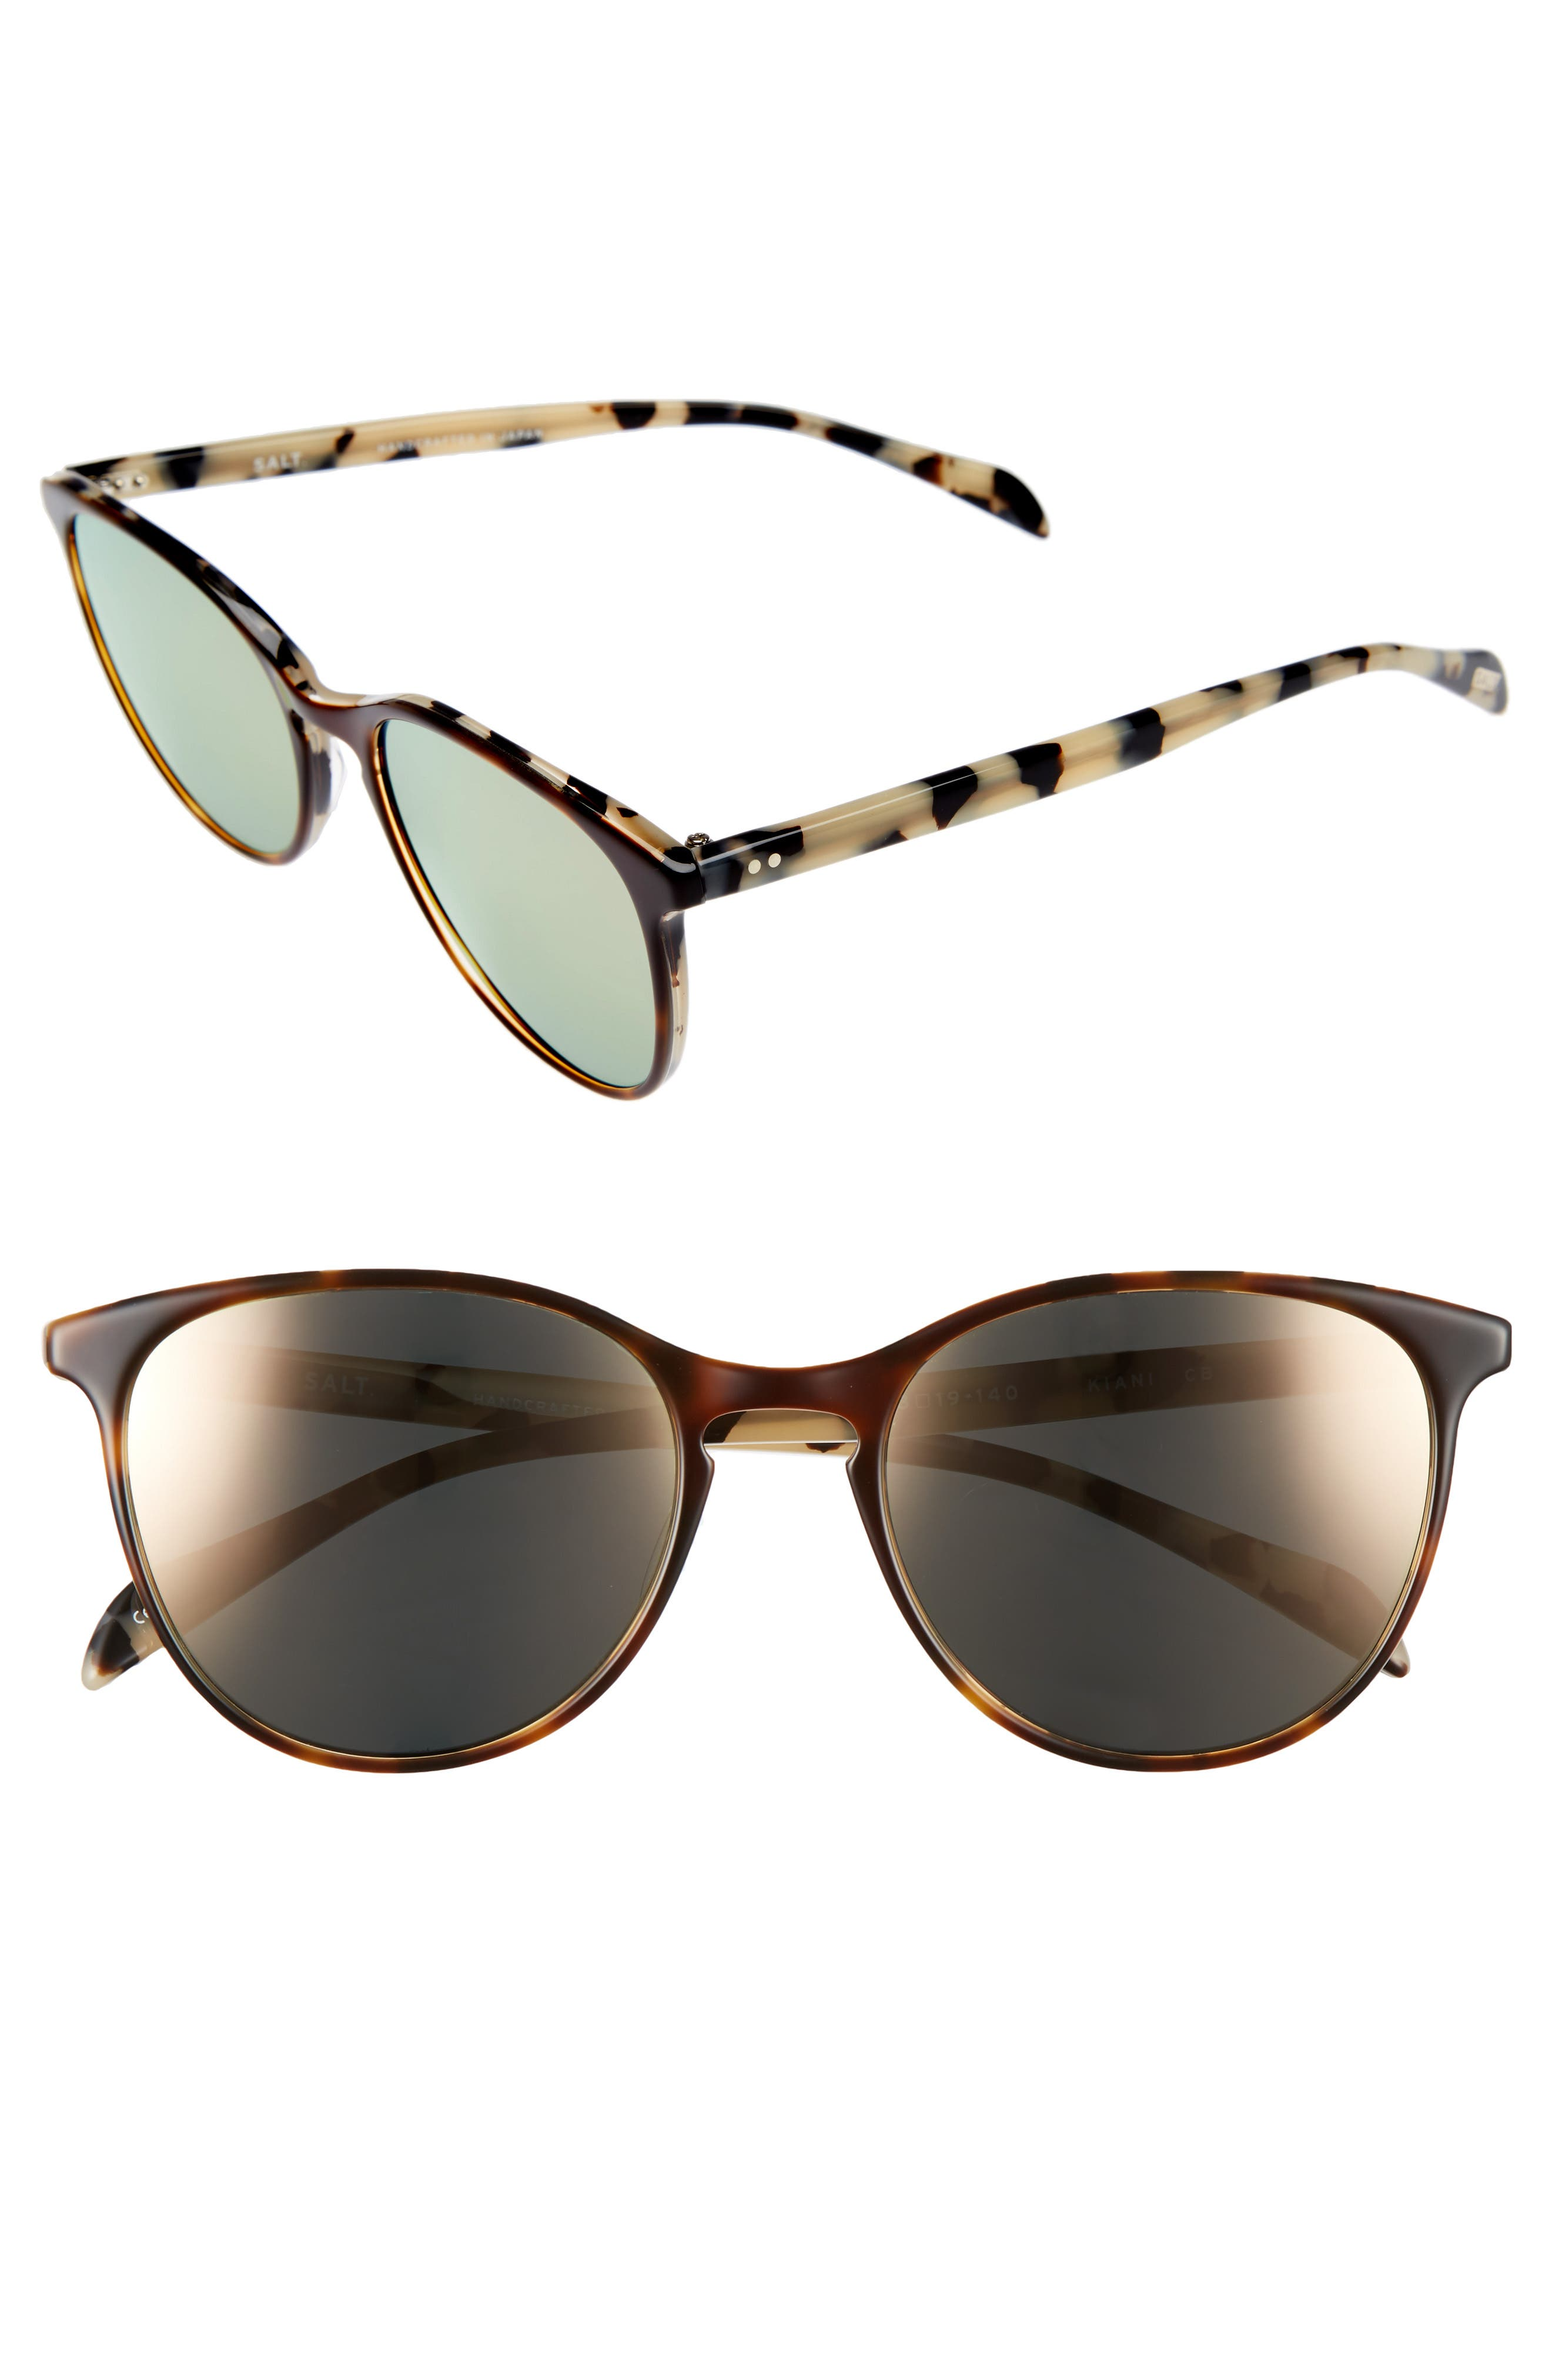 Kiani 53mm Polarized Retro Sunglasses by Salt